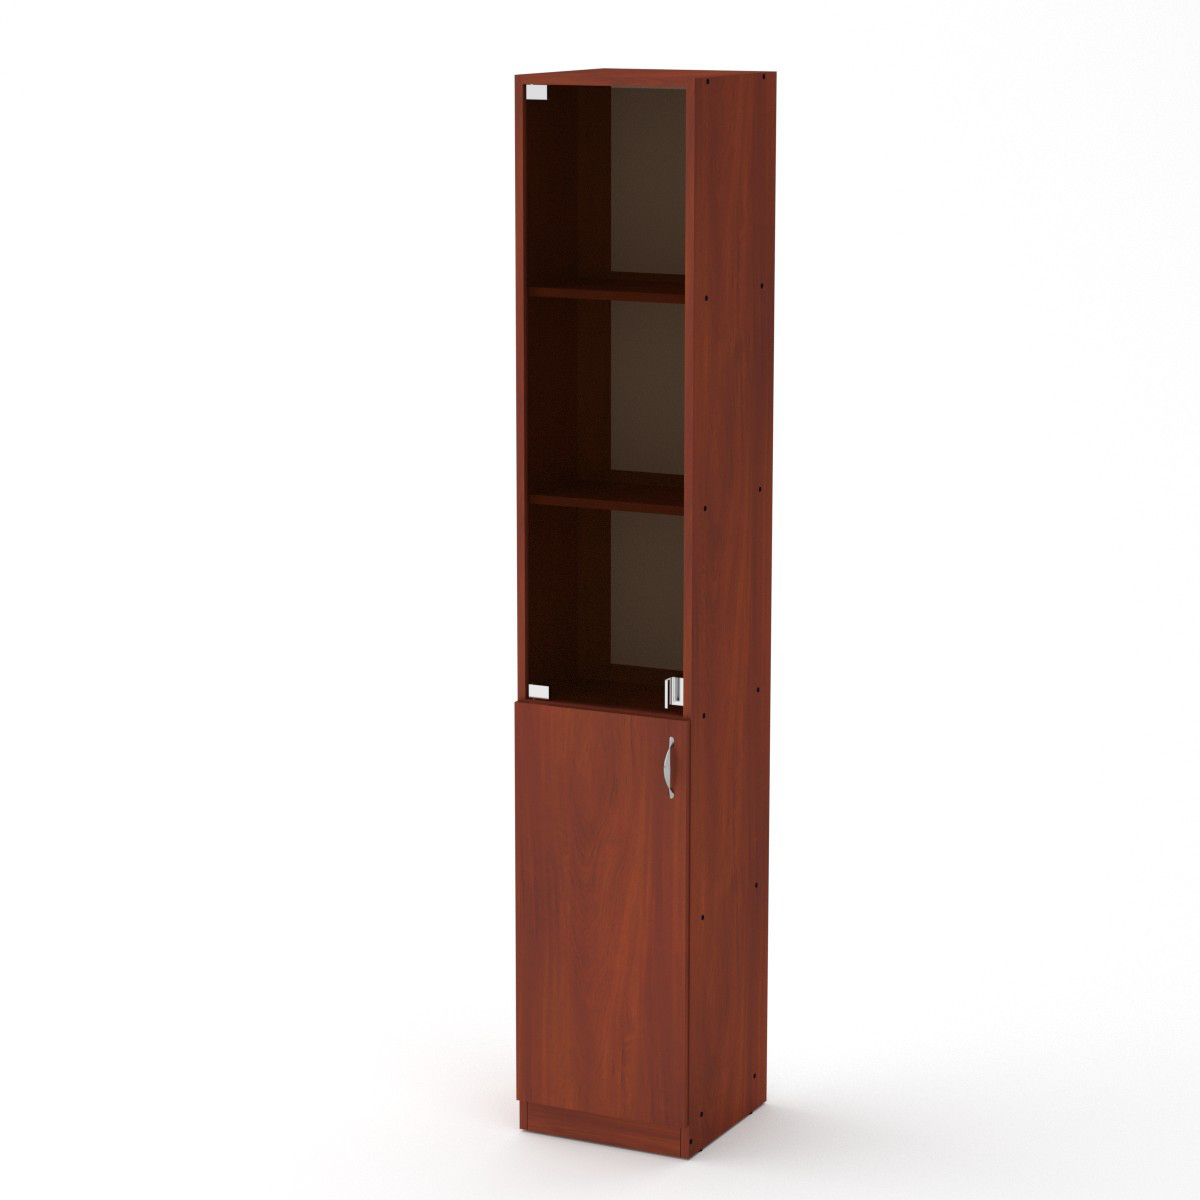 Шкаф книжный КШ-9 яблоня Компанит (35х37х195 см)